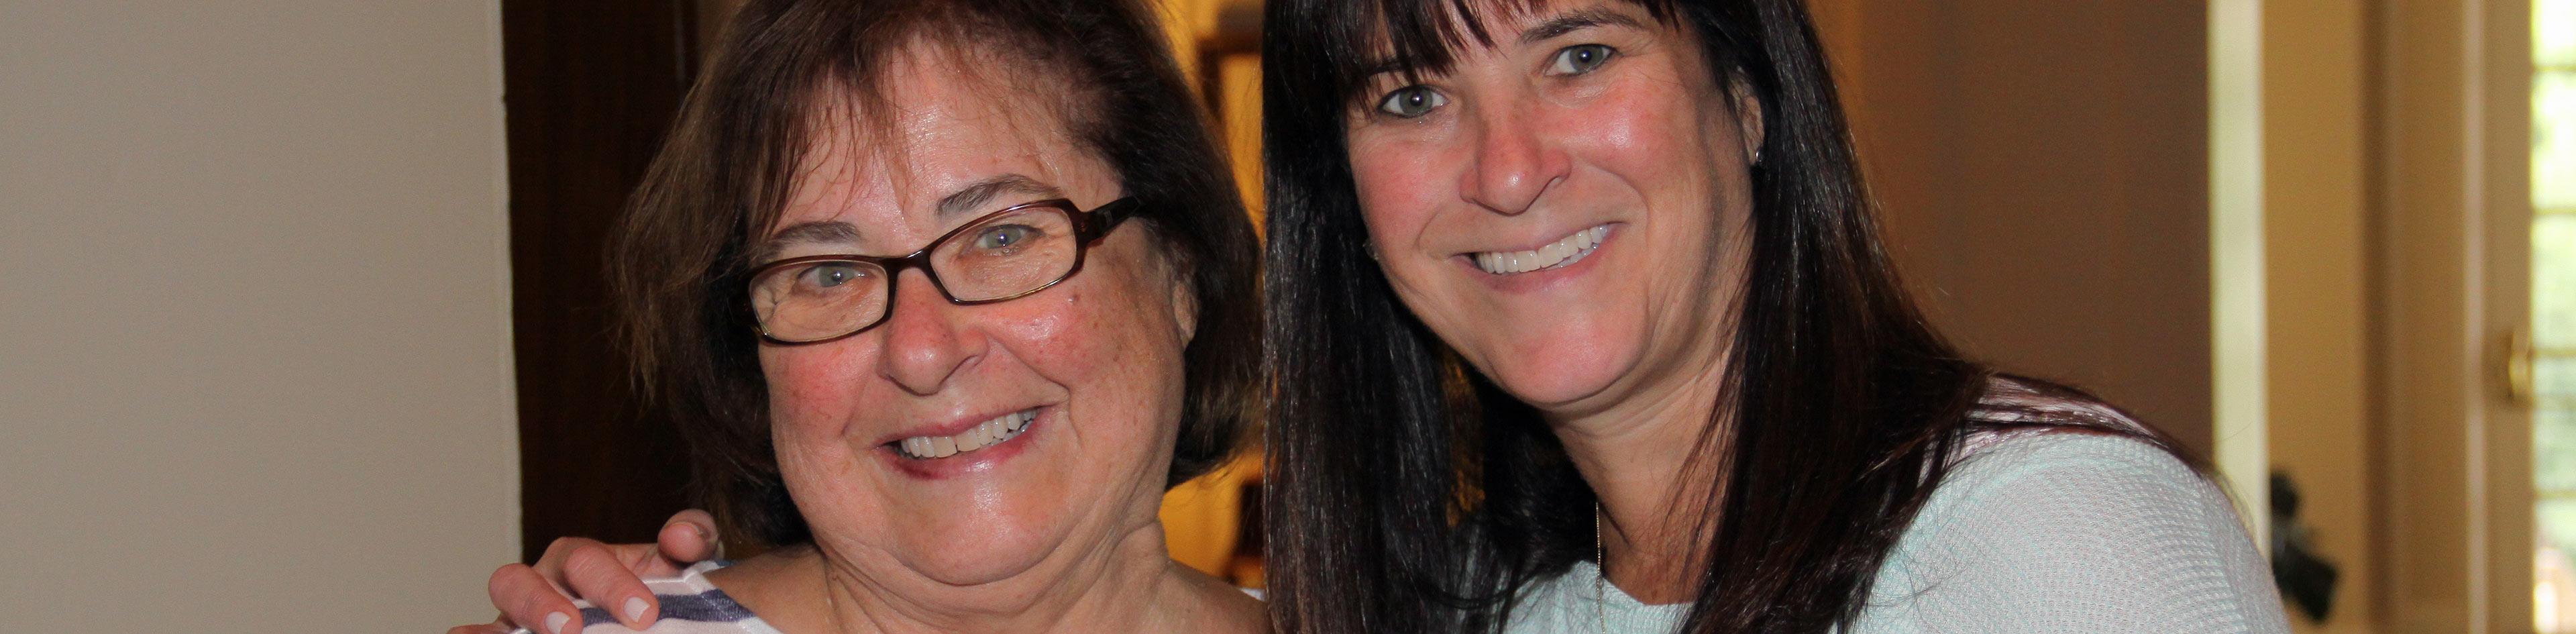 JWFA Trustees catch up on Jewish grants.